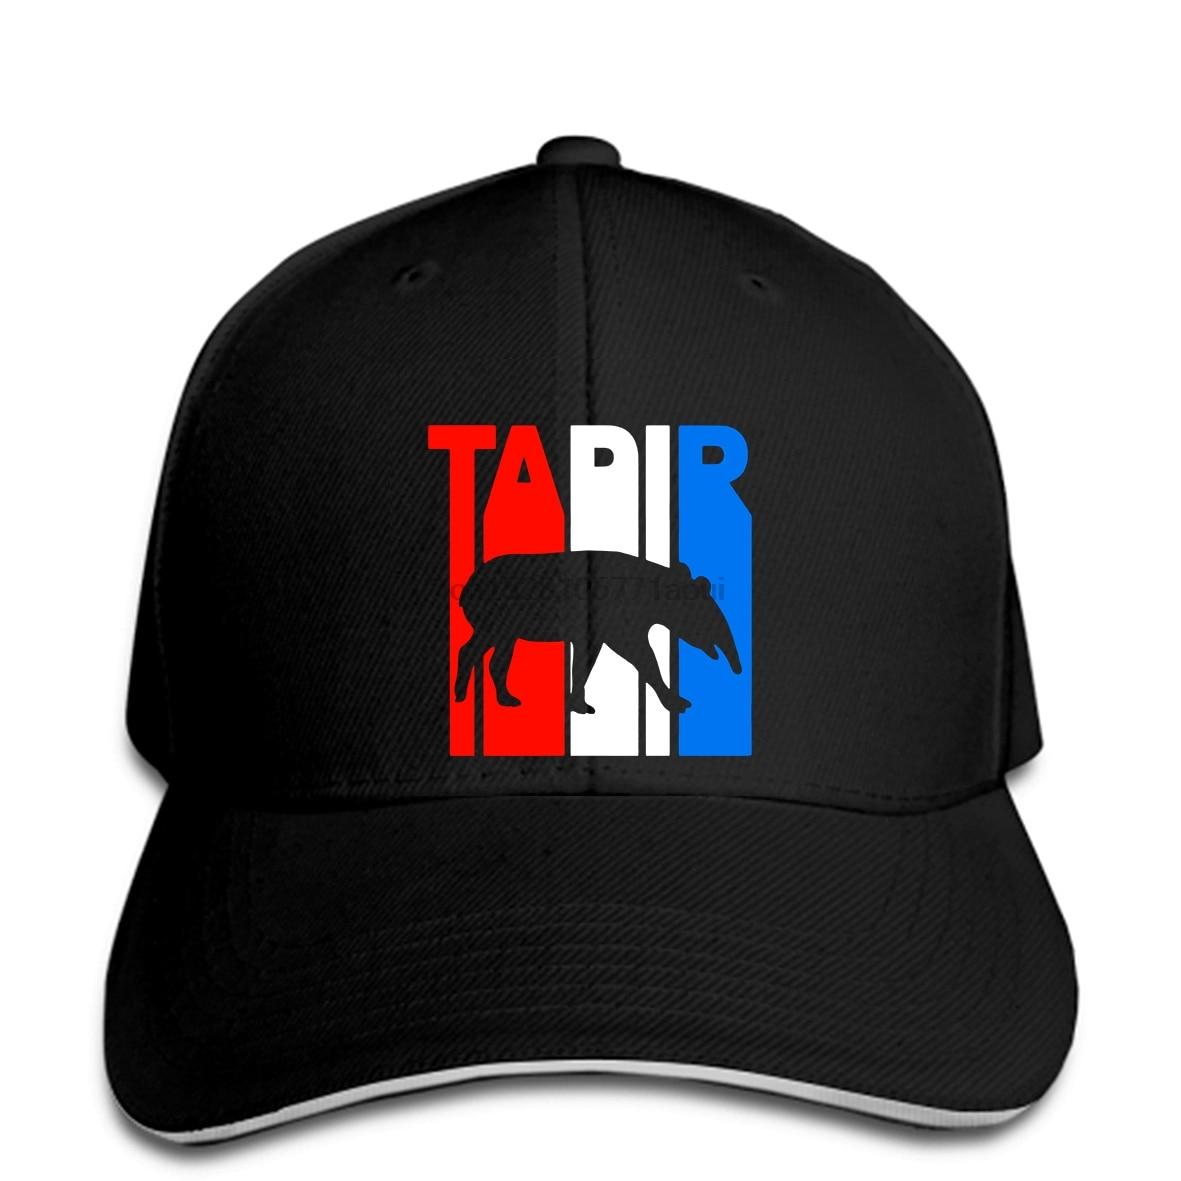 Gorra de béisbol divertida para hombre, gorra estampada para mujer, novedad, gorra Retro RWnB Tapir, silueta, gorras de béisbol geniales, gorras de béisbol